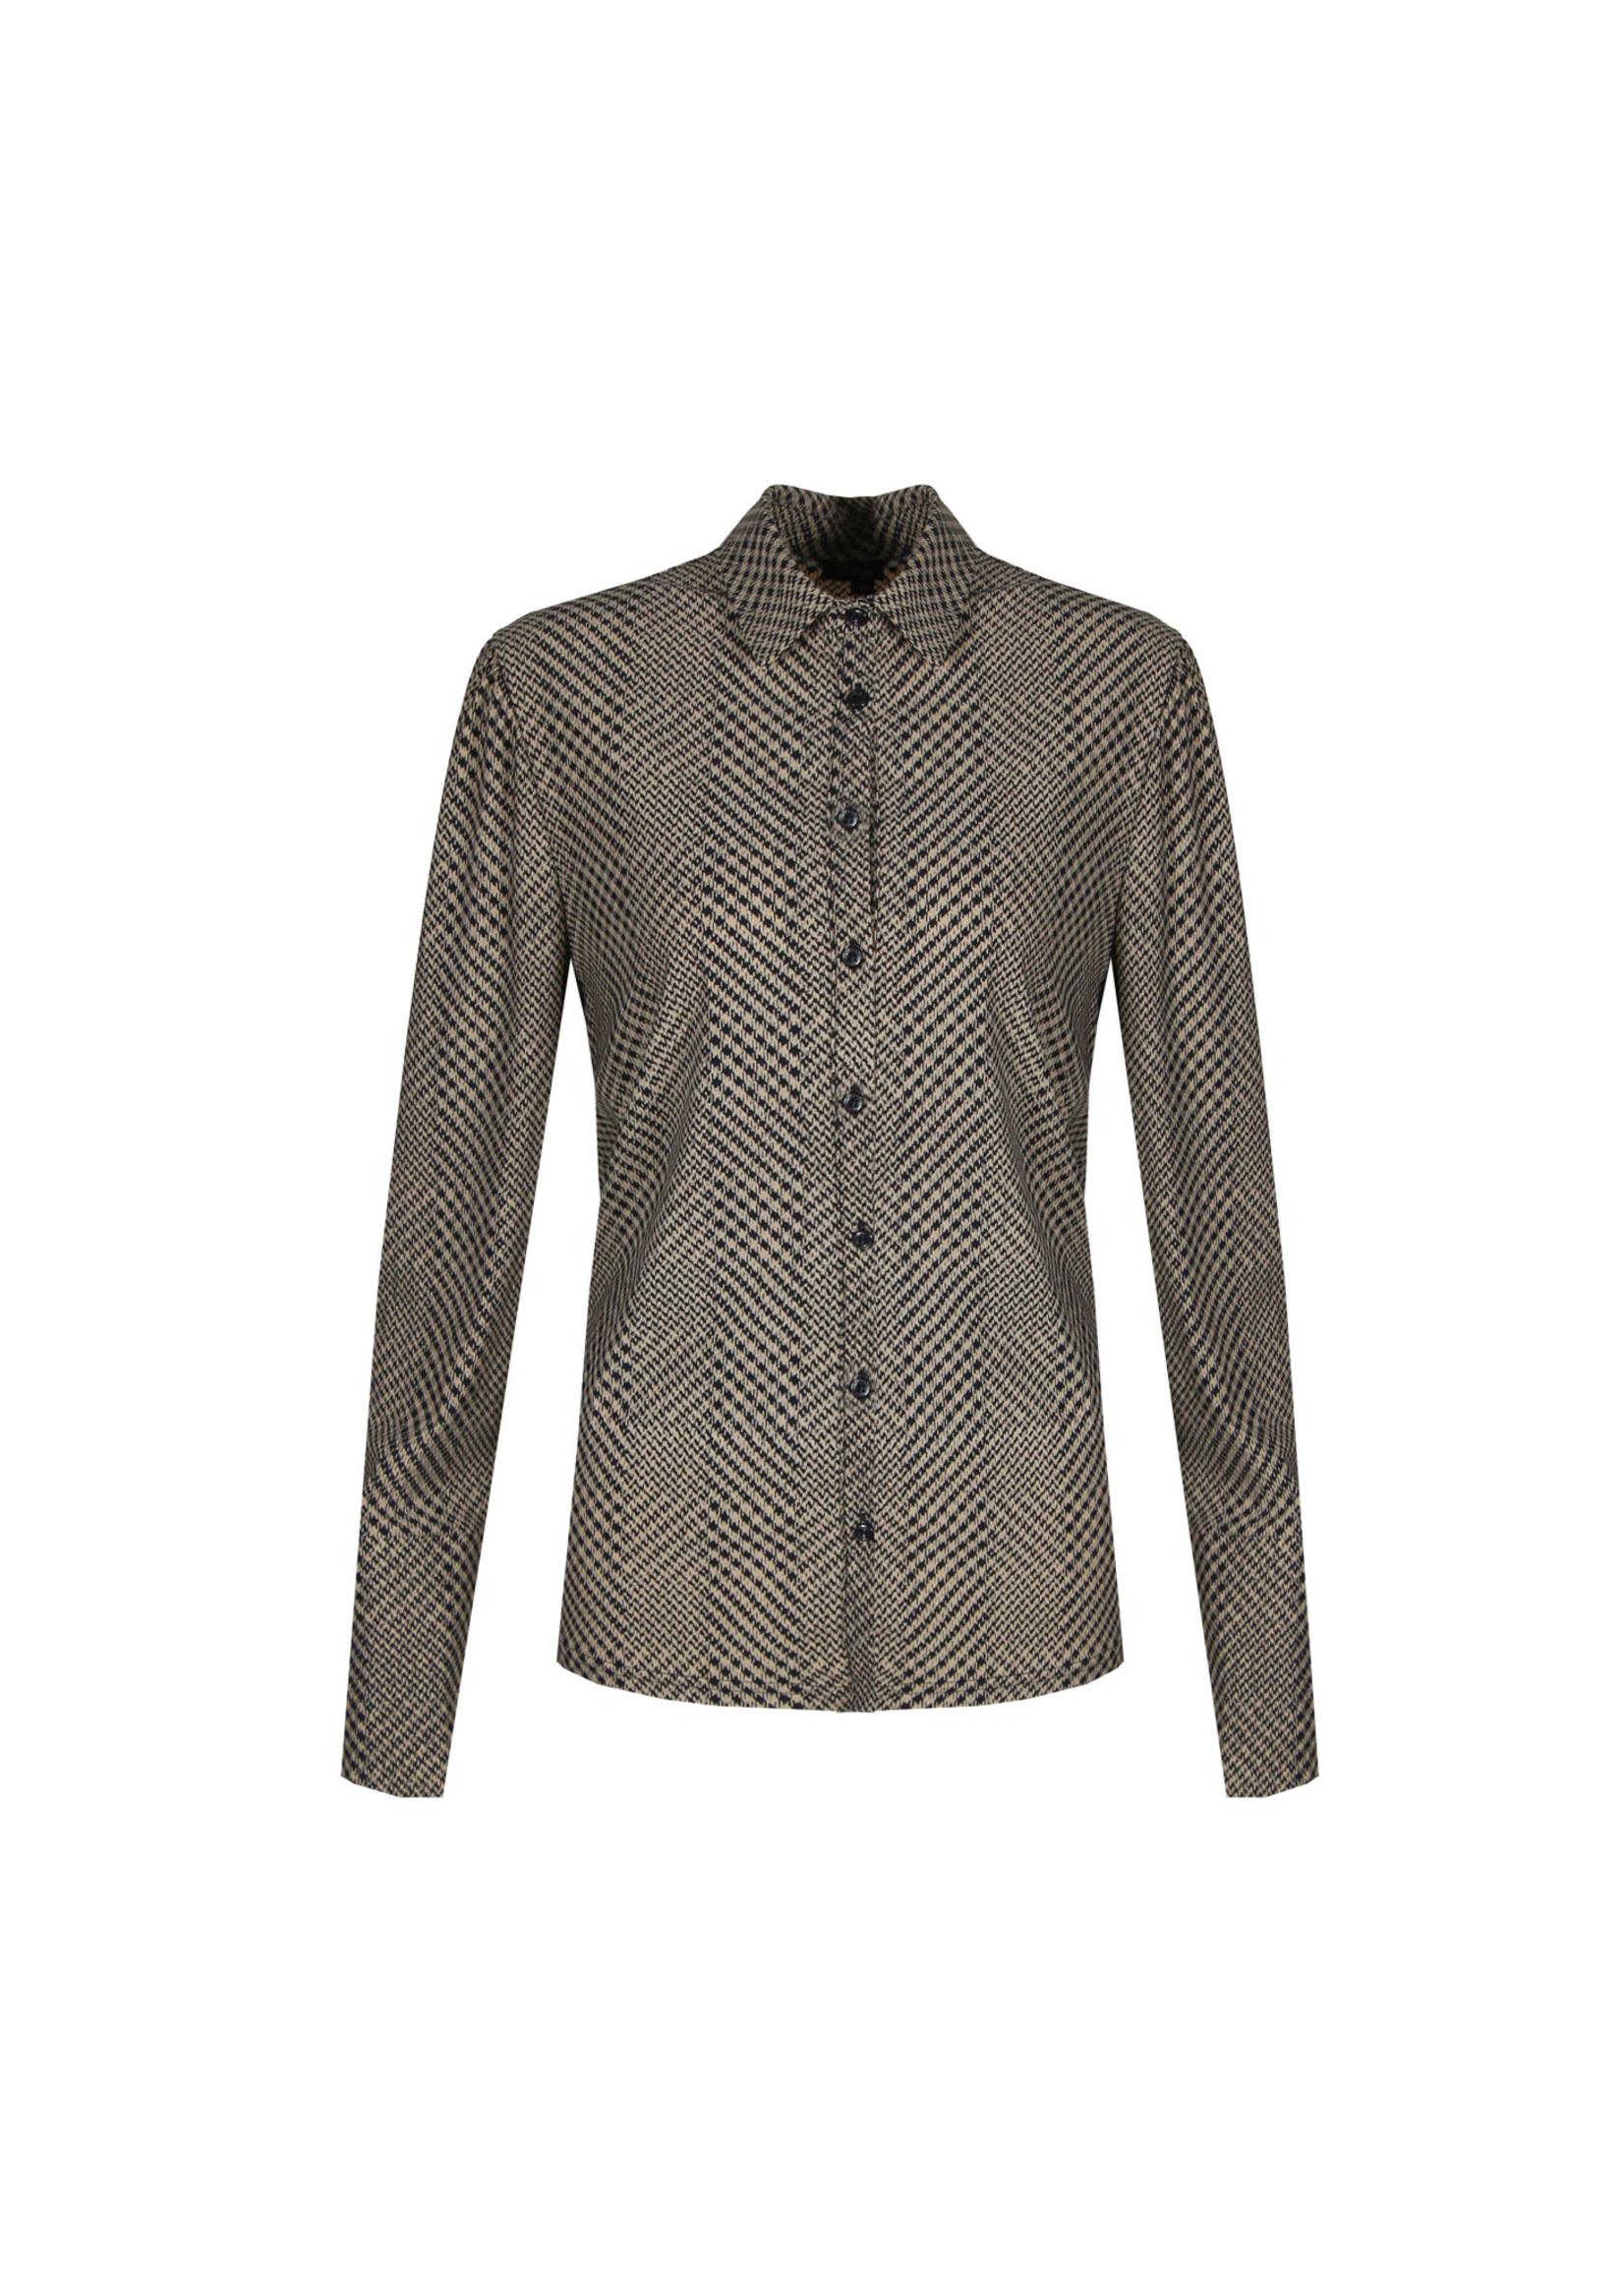 G-Maxx G-maxx - Kyla blouse - zwart/sahara